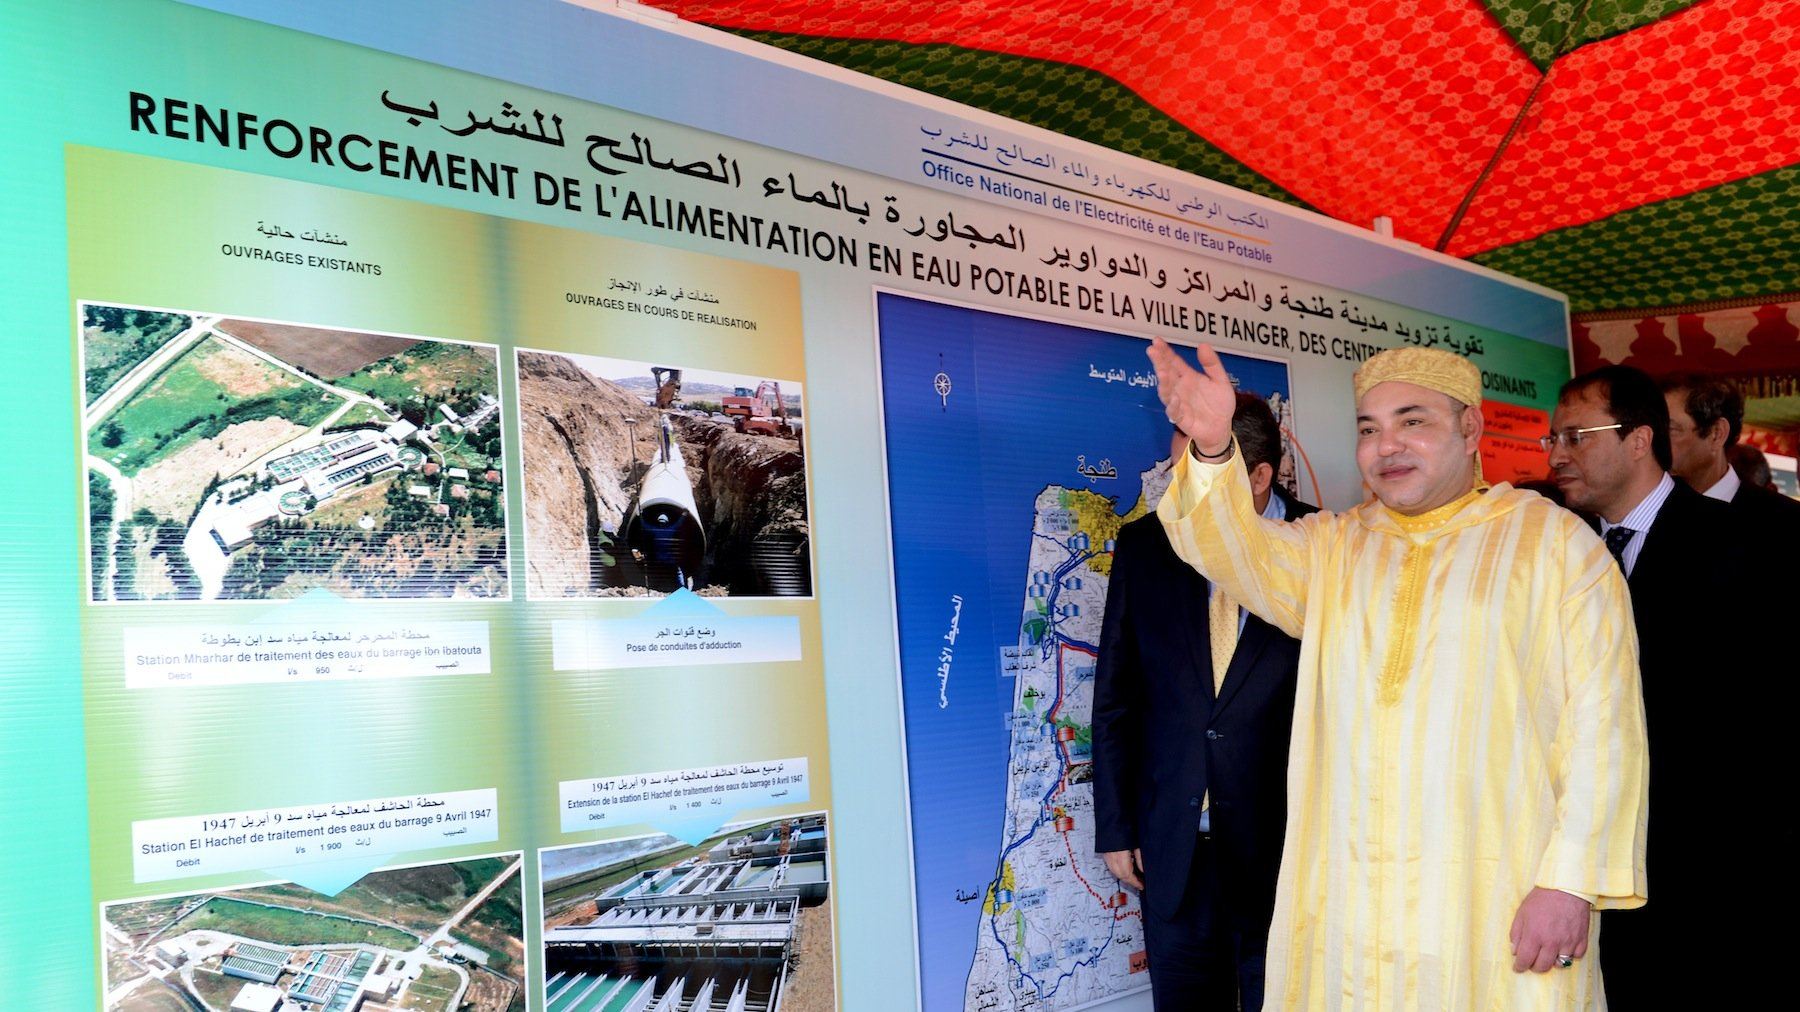 Inauguration royale du tronçon autoroutier Beni Mellal-Khourbiga